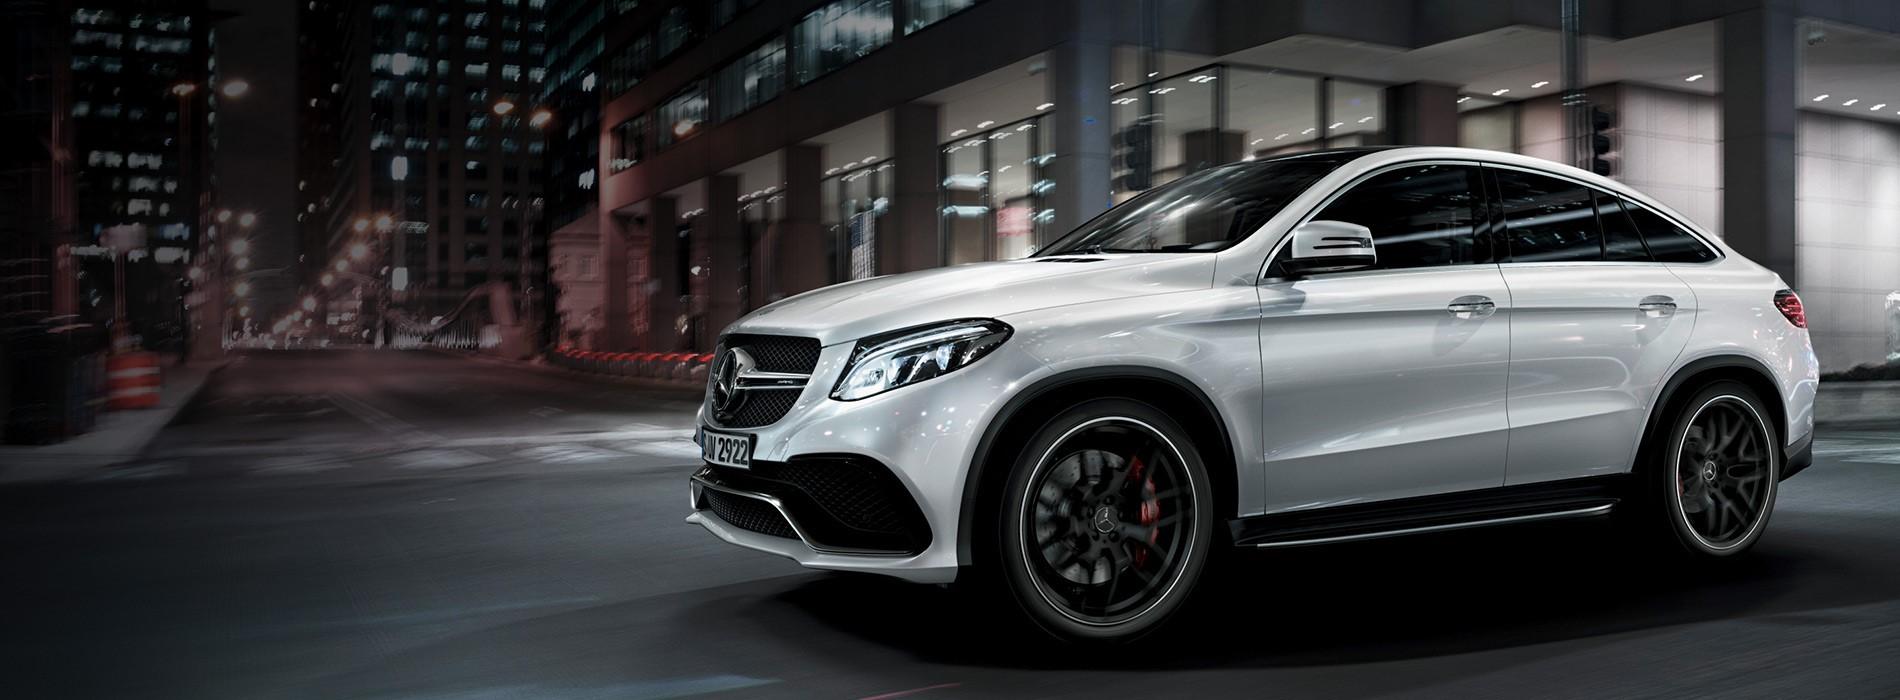 Mercedes-AMG GLE Coupé 2020